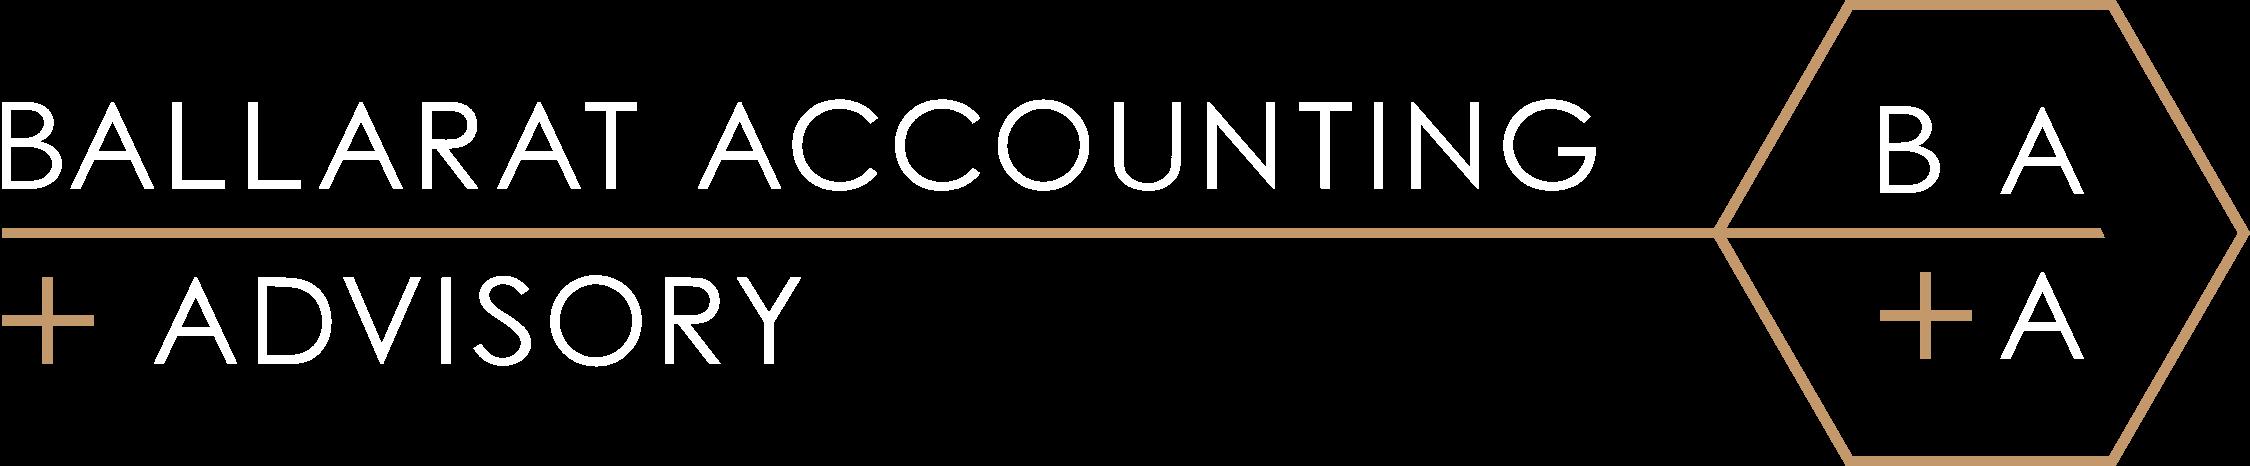 Ballarat Accounting and Advisory Logo